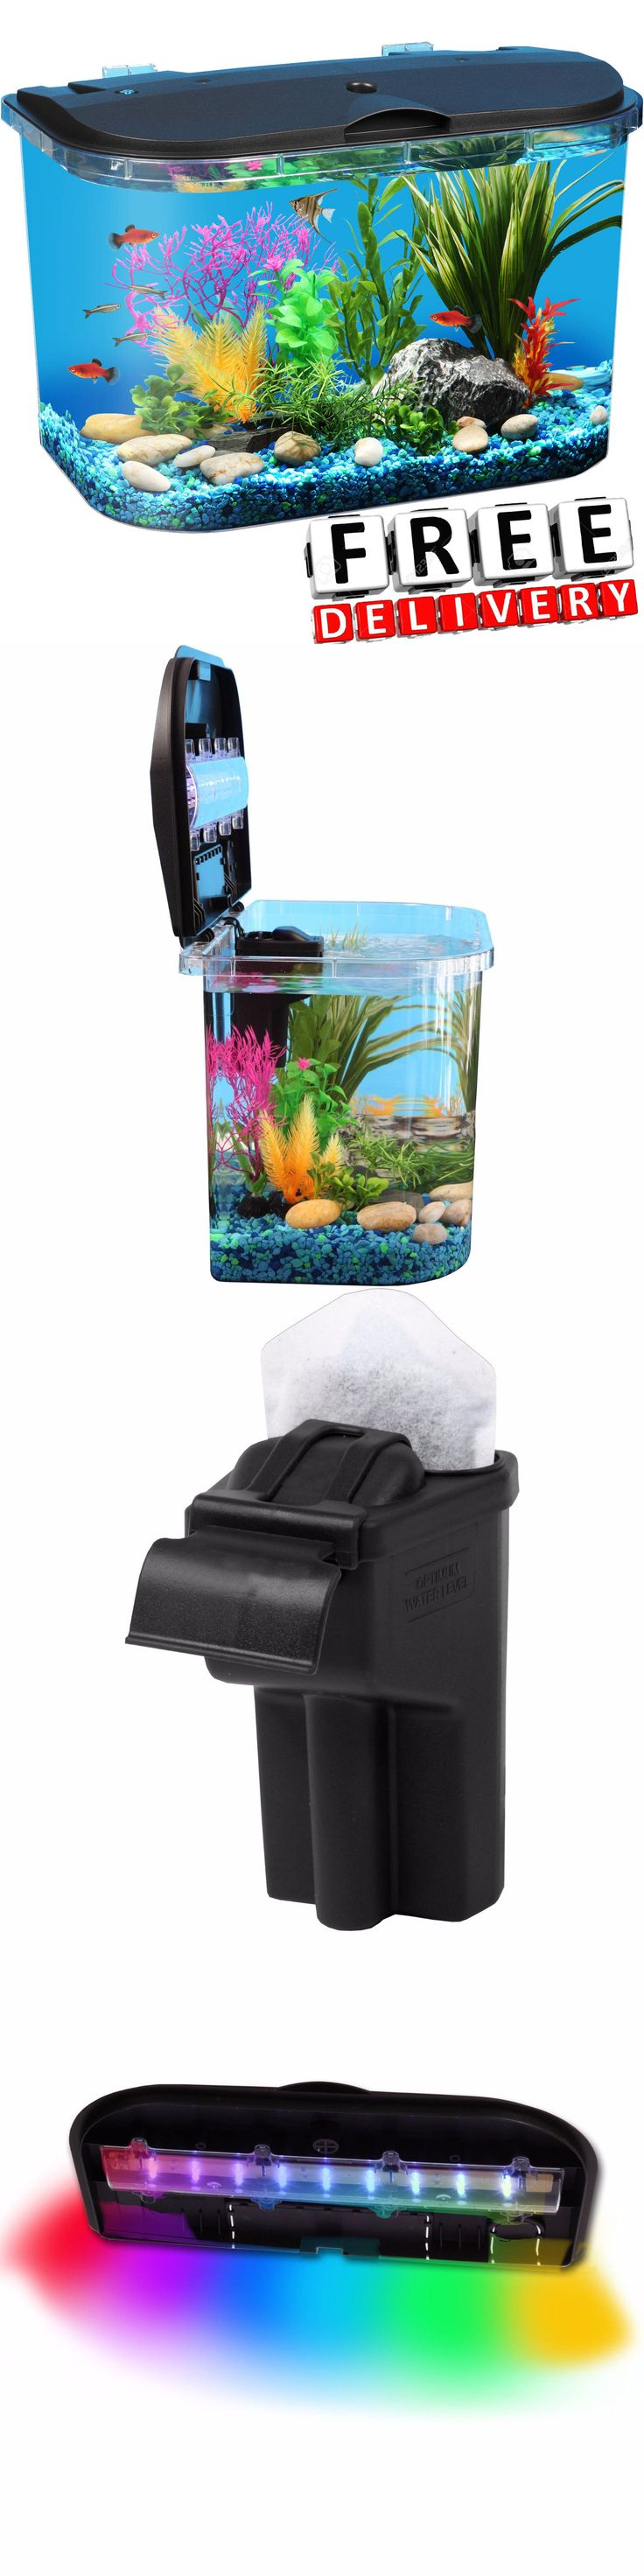 Fish tank volume calculator cm - Aquariums And Tanks 20755 Aquarium 5 Gallon Led Lighting Power Filter Decoration Tropical Fish Water